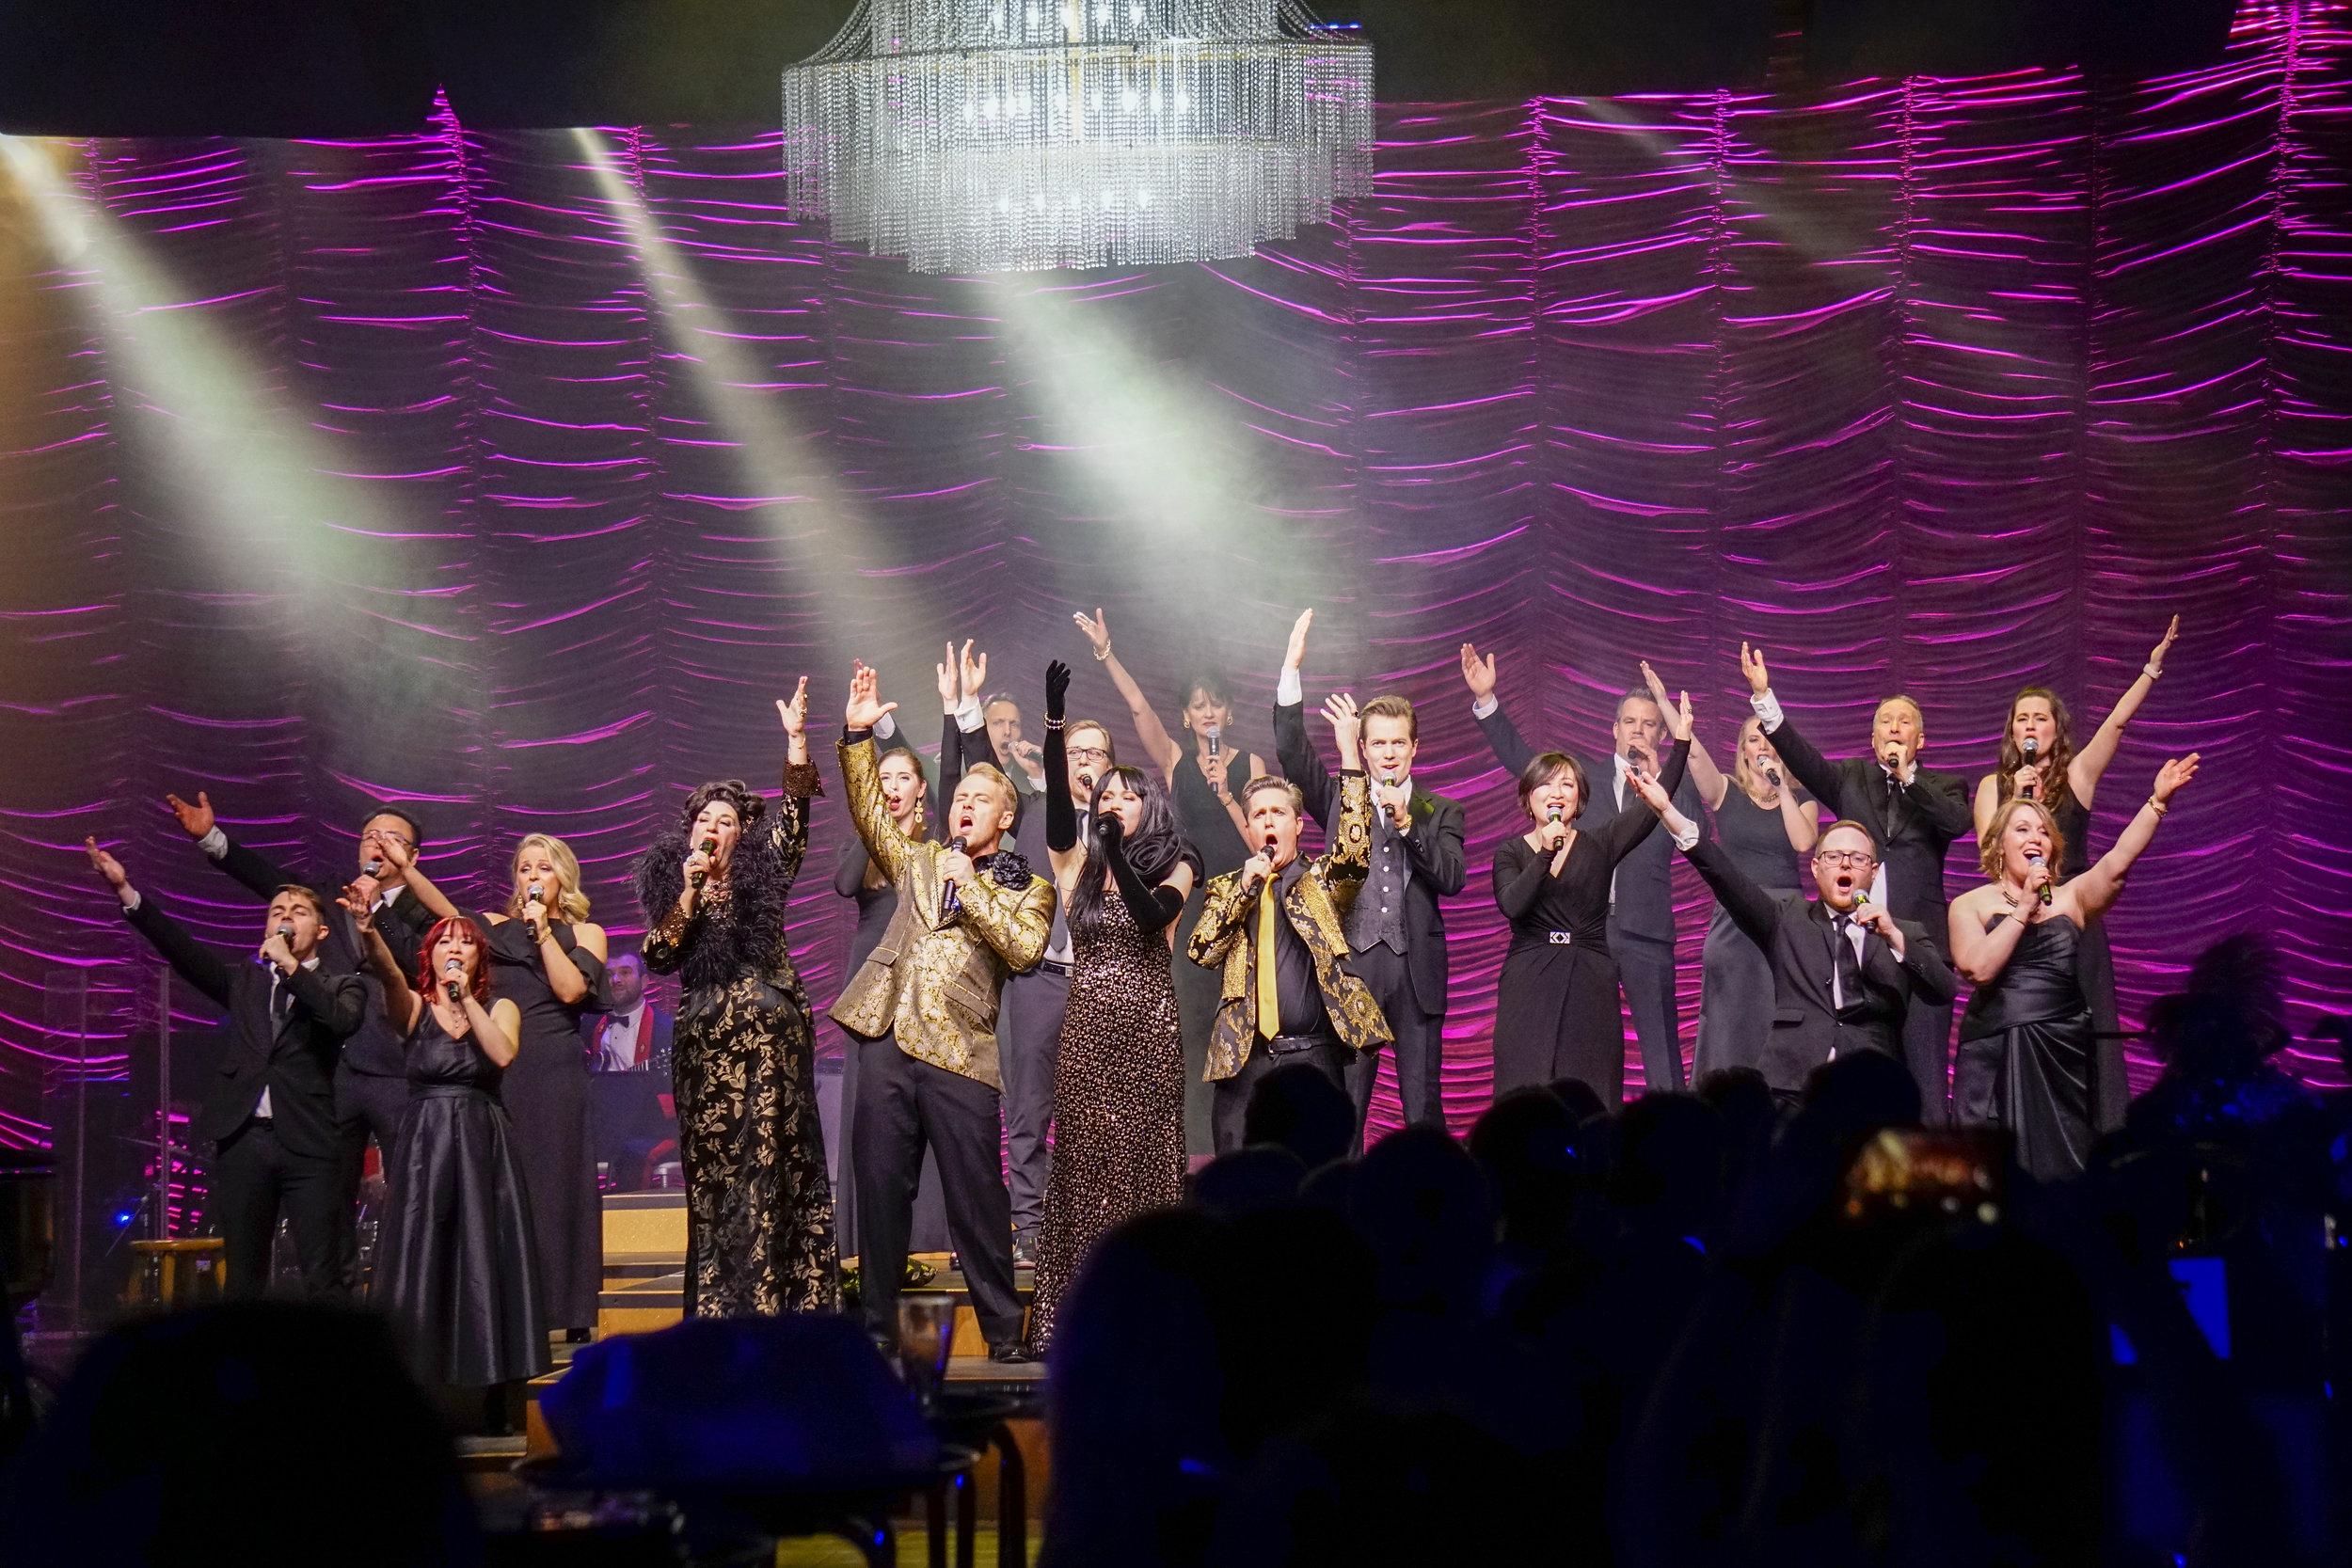 The Edmonton Opera Chorus rocks the house with a Queen medley